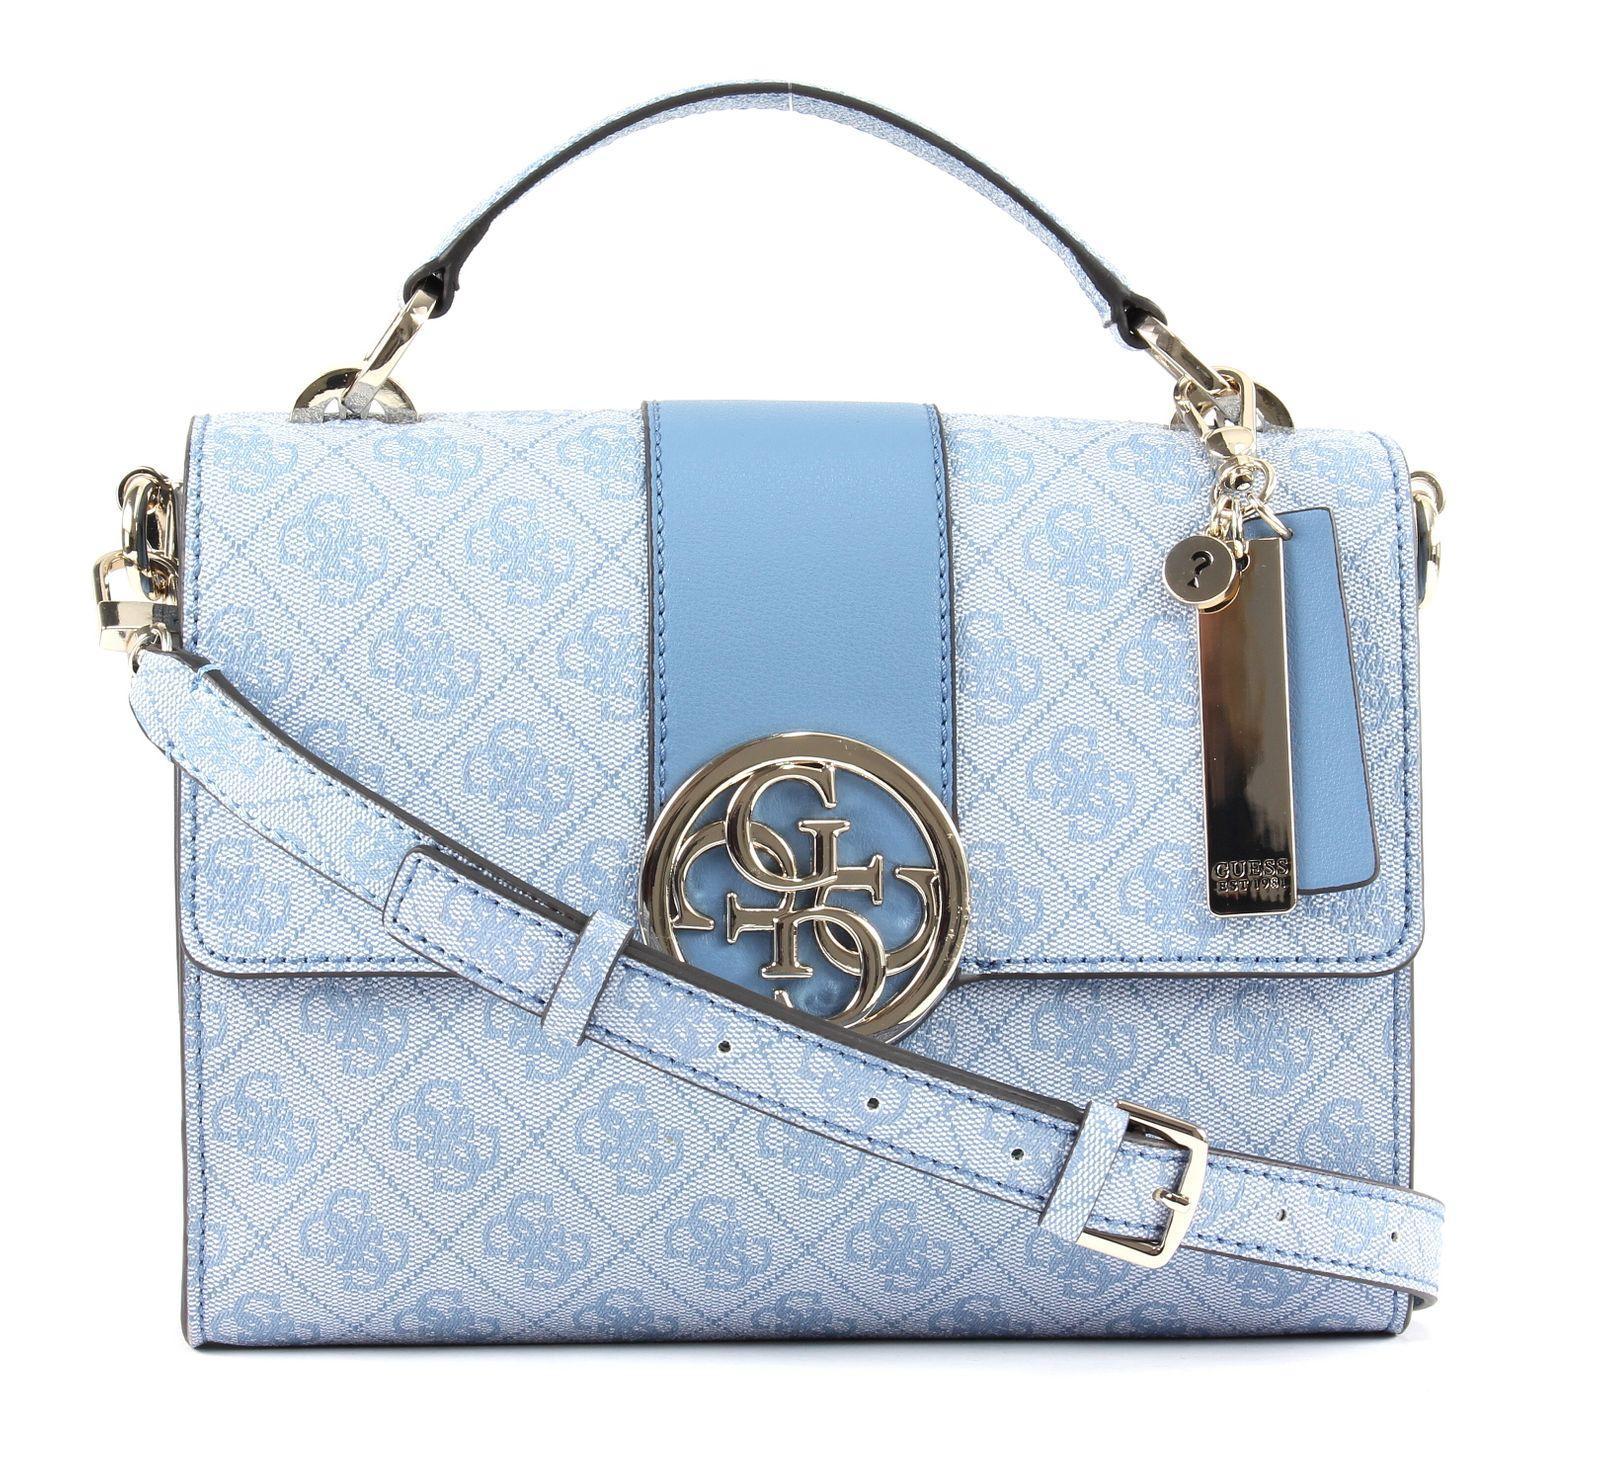 GUESS Bluebelle Top Handle Flap Blue